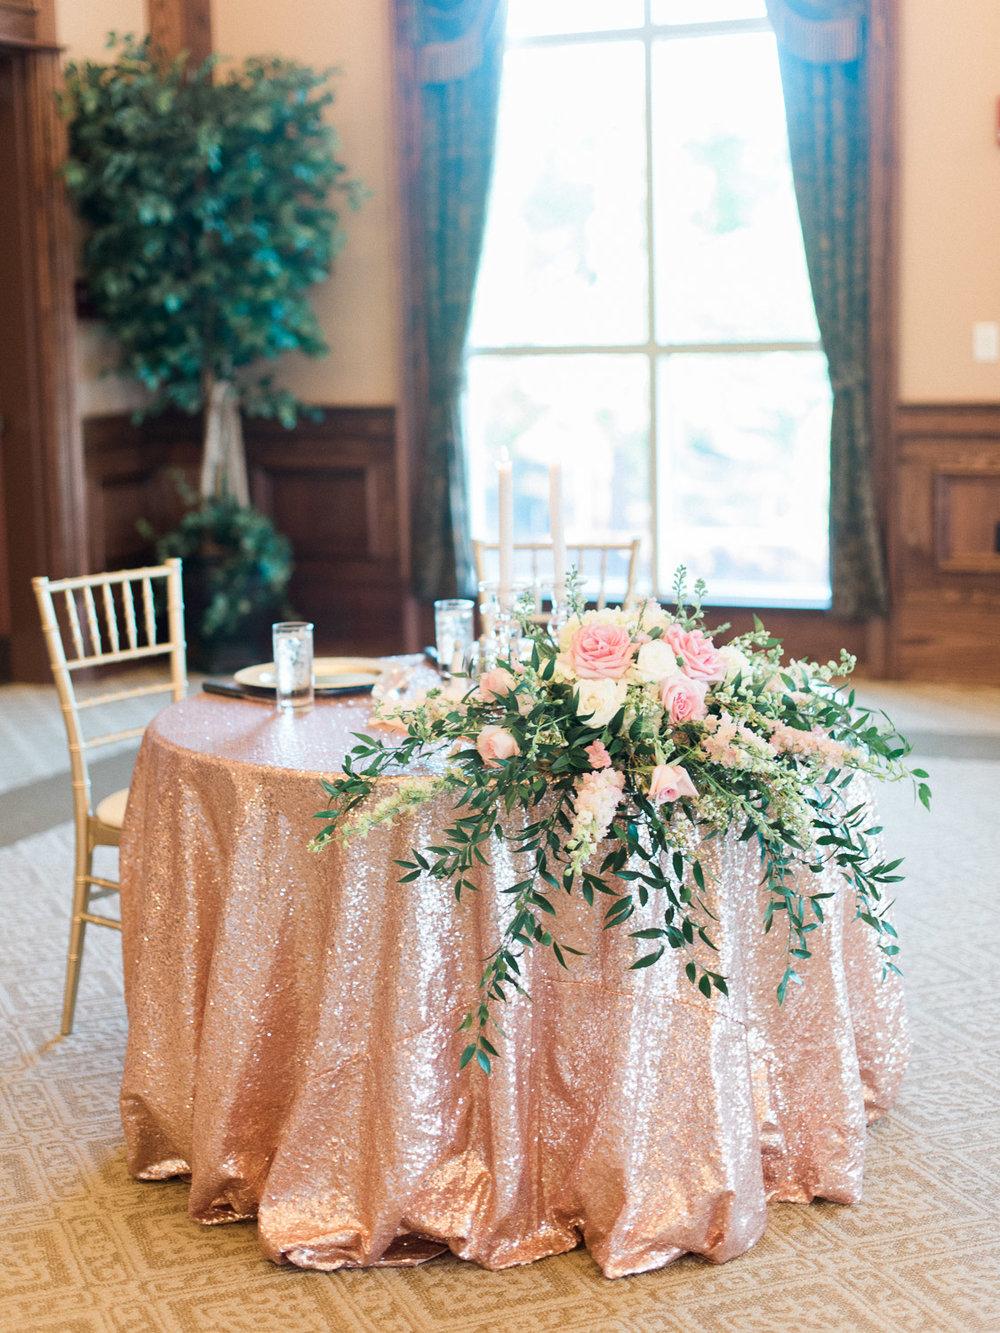 alexgreg-wedding-detailsreception-christinadavisphoto12.jpg